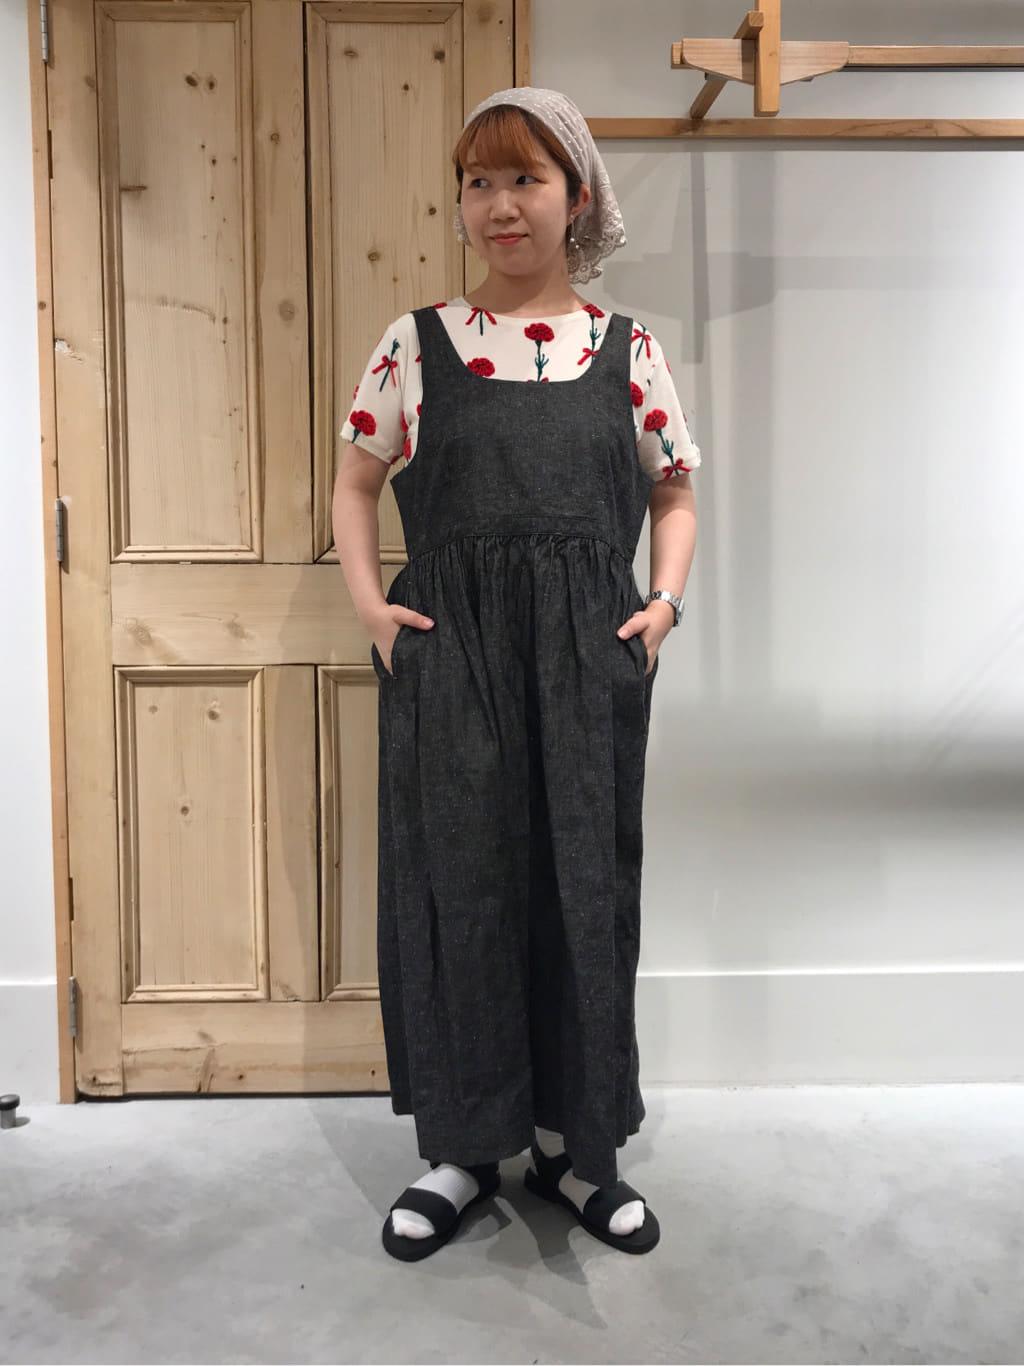 Malle chambre de charme 調布パルコ 身長:155cm 2021.06.29